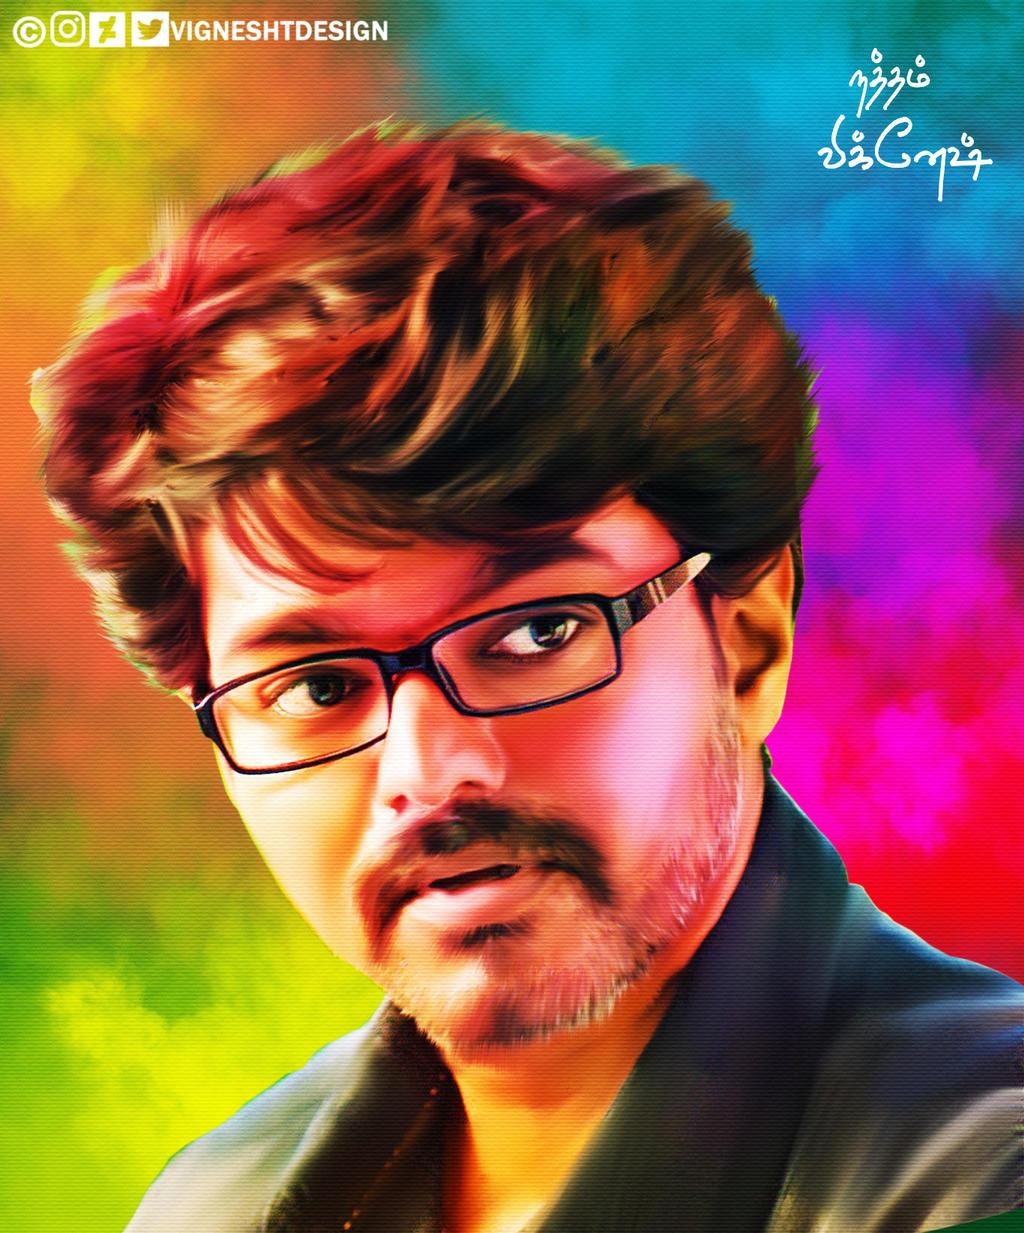 Hd wallpaper vijay -  Theri Vijay Painting Hd Image By Vigneshtdesign